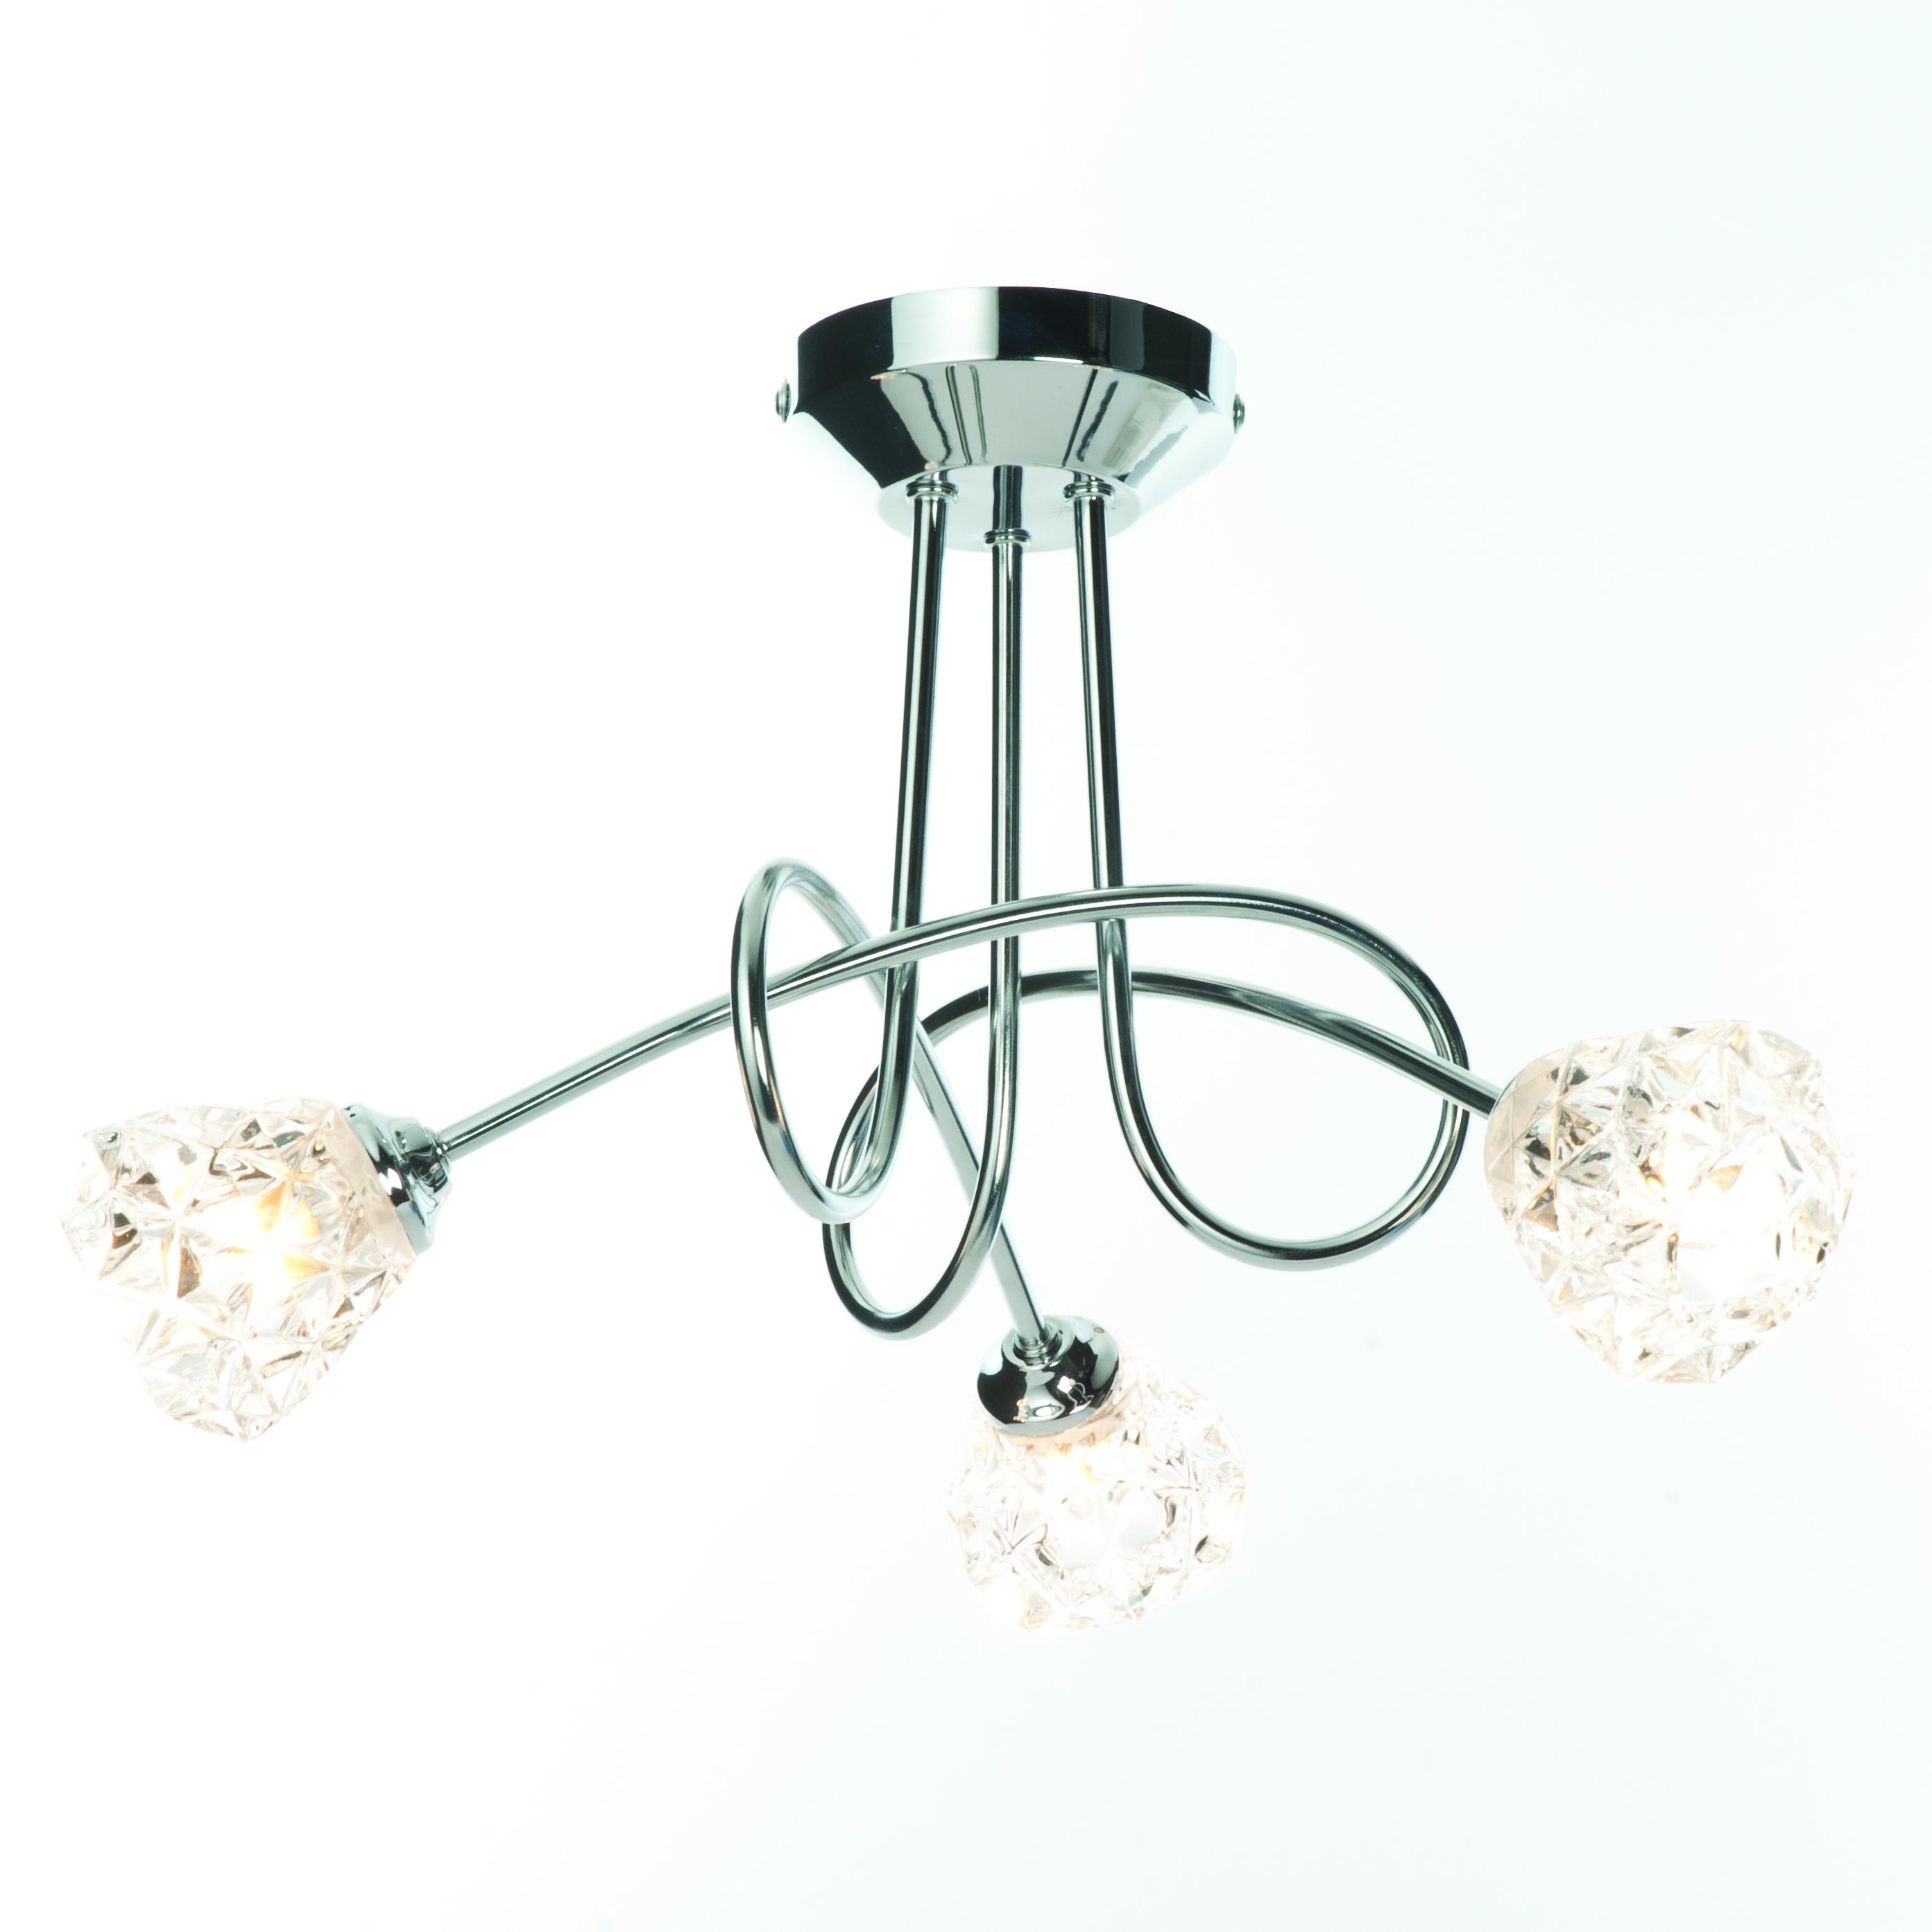 Ceiling Light Crossbar : Modern chrome way cross over ceiling light fitting